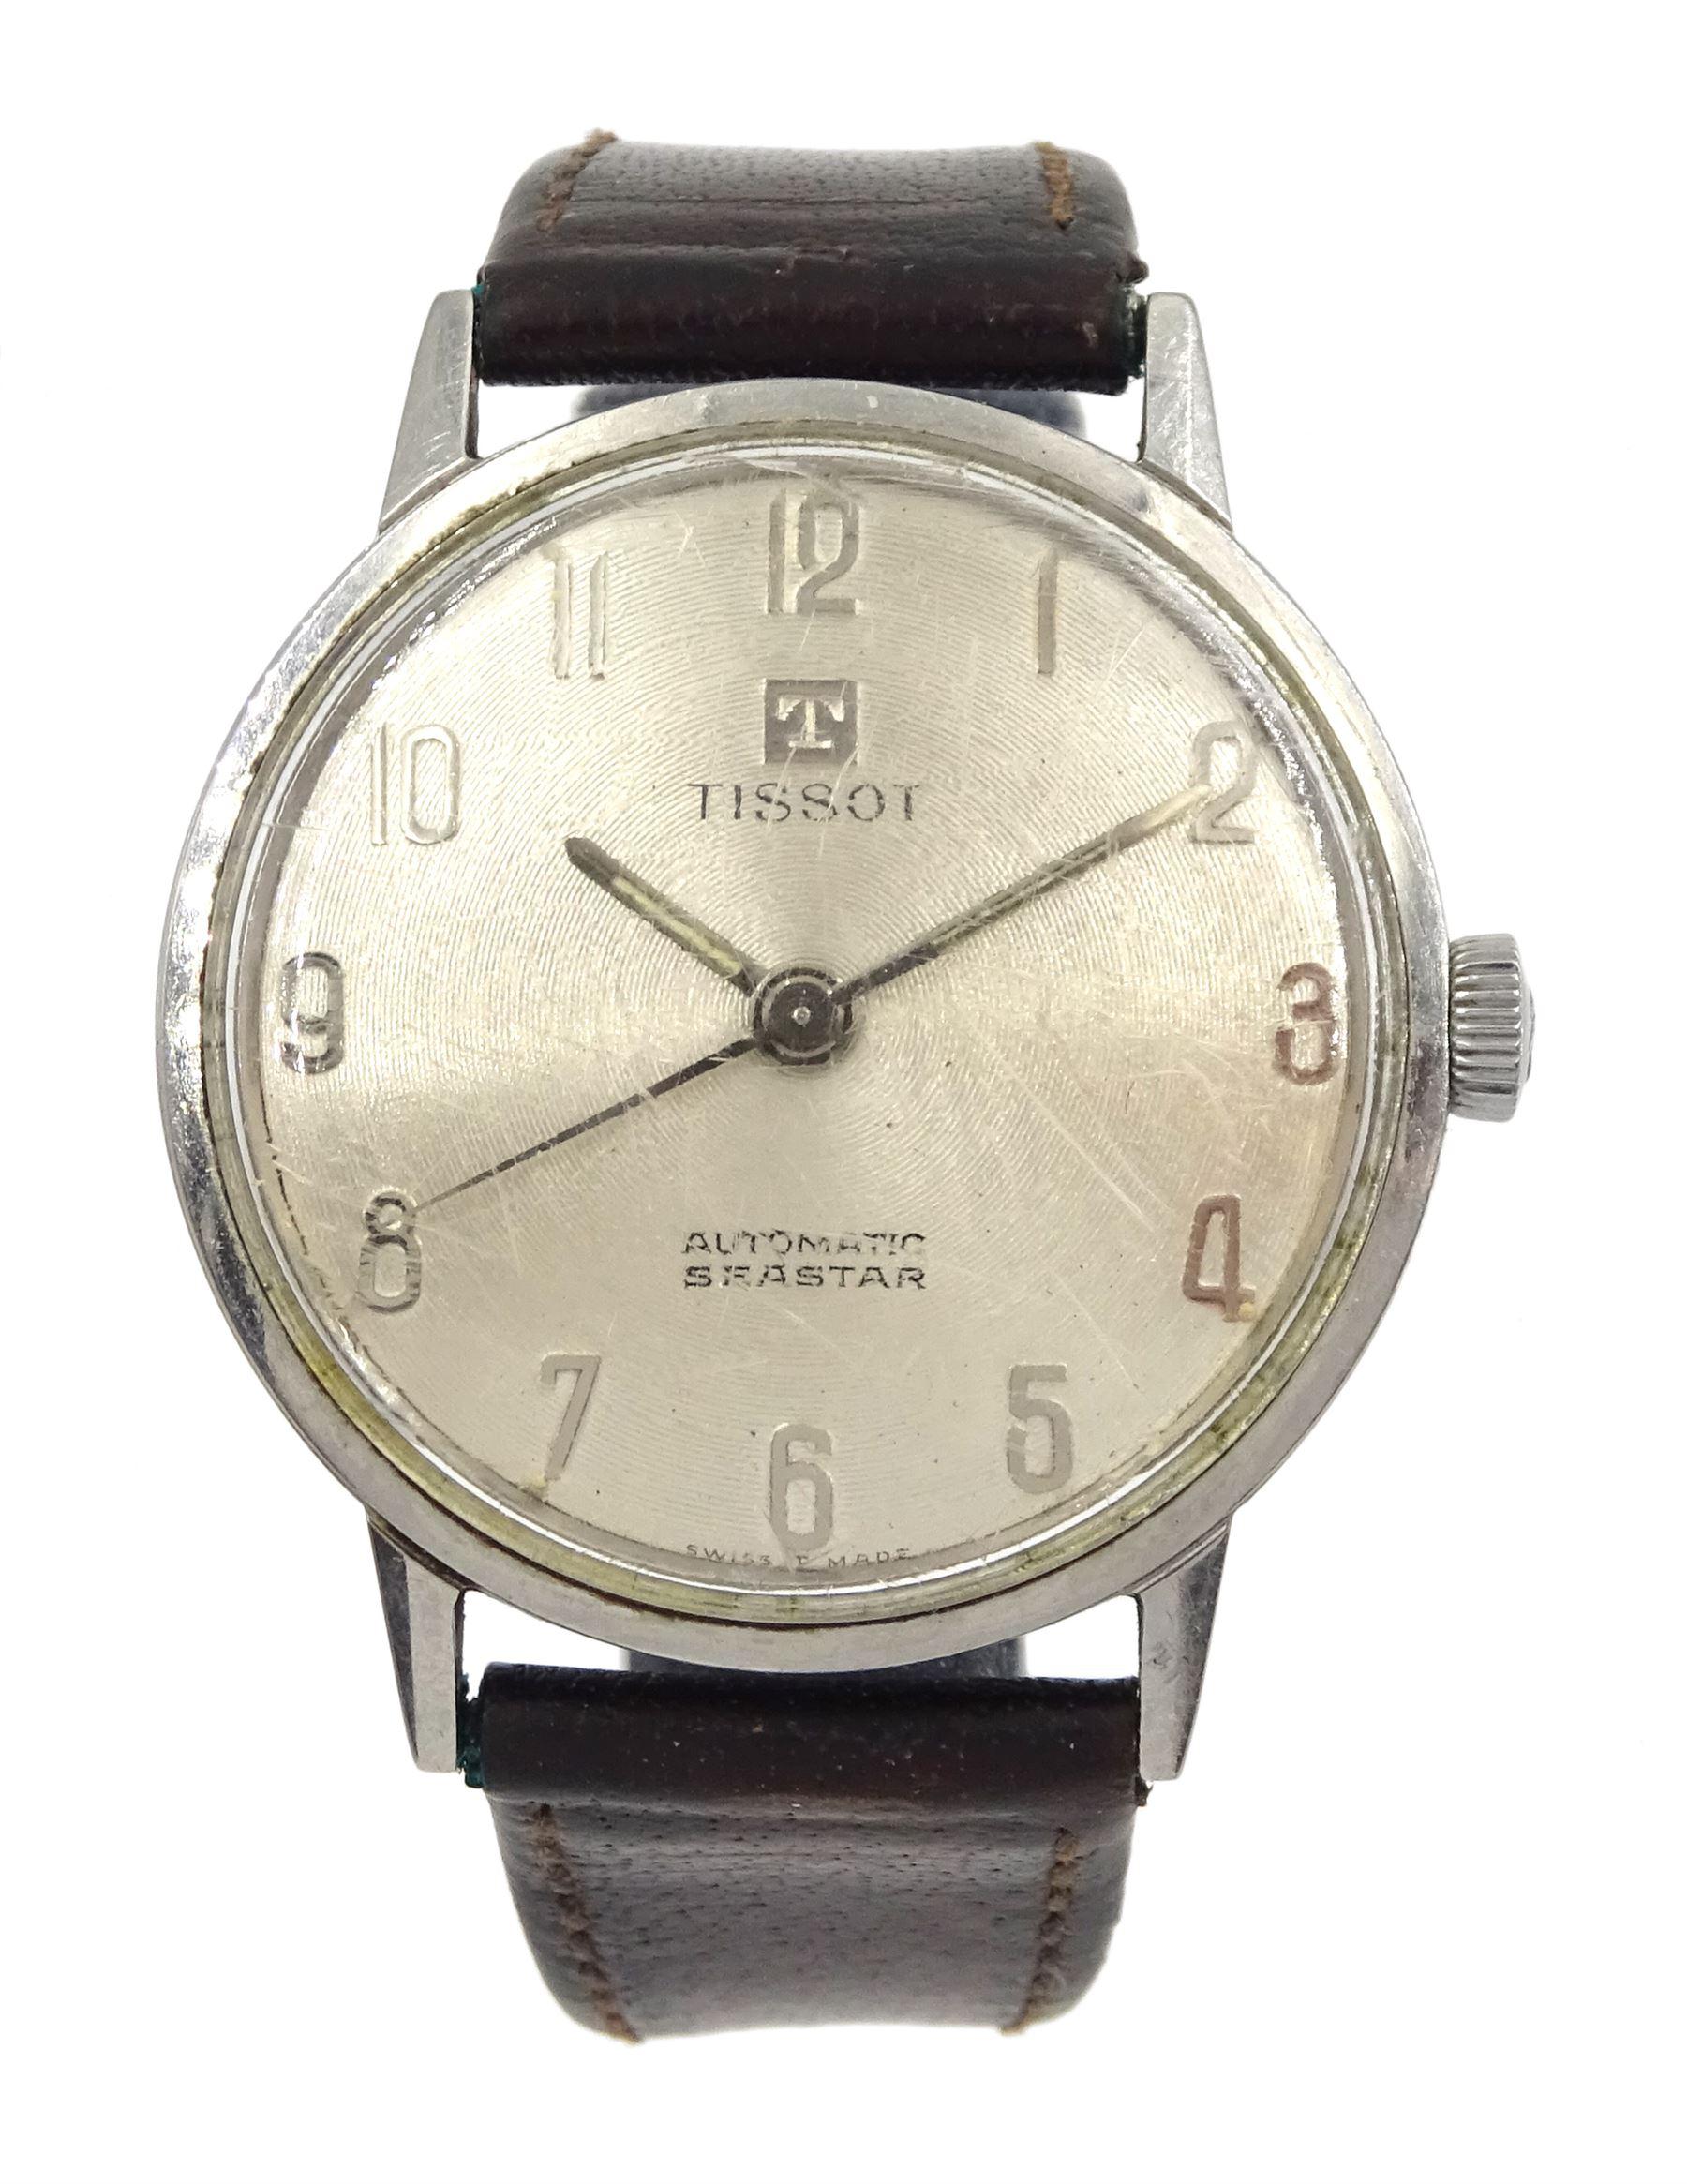 Tissot Automatic Seastar gentleman's stainless steel wristwatch No. 43540